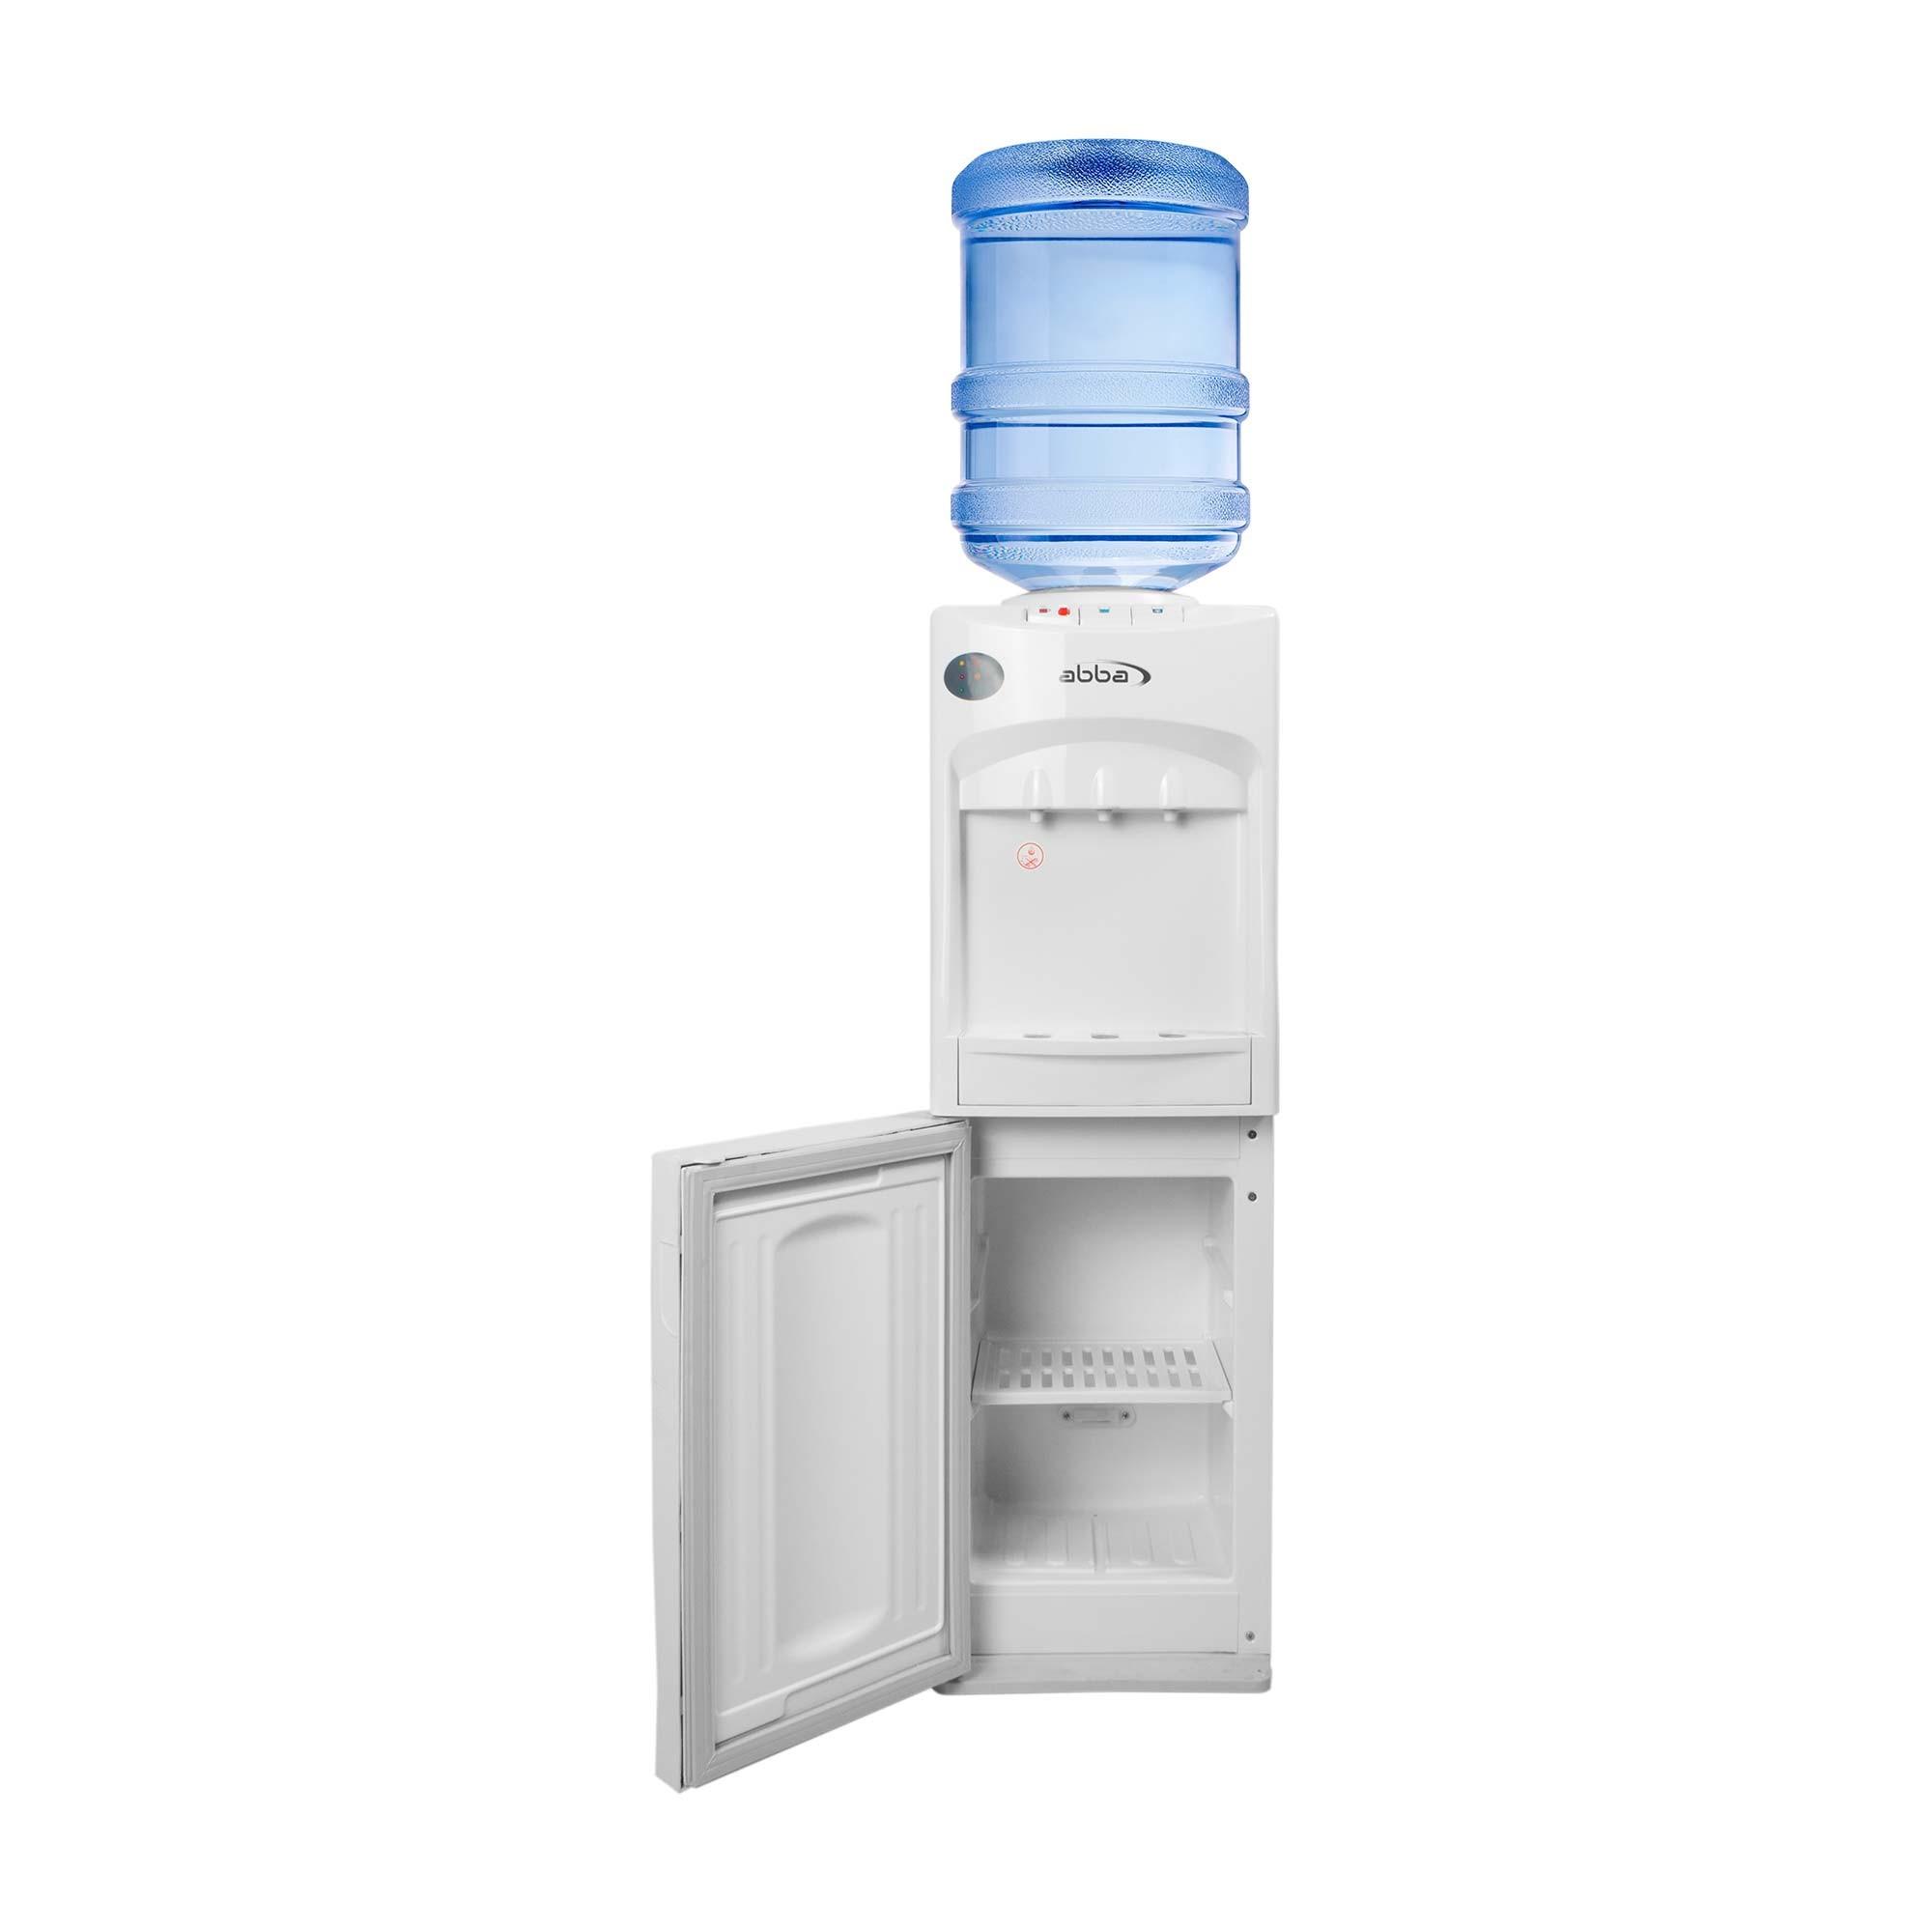 Dispensador de agua abba 2 5lts da1032 as b alkosto tienda for Dispensador agua fria media markt